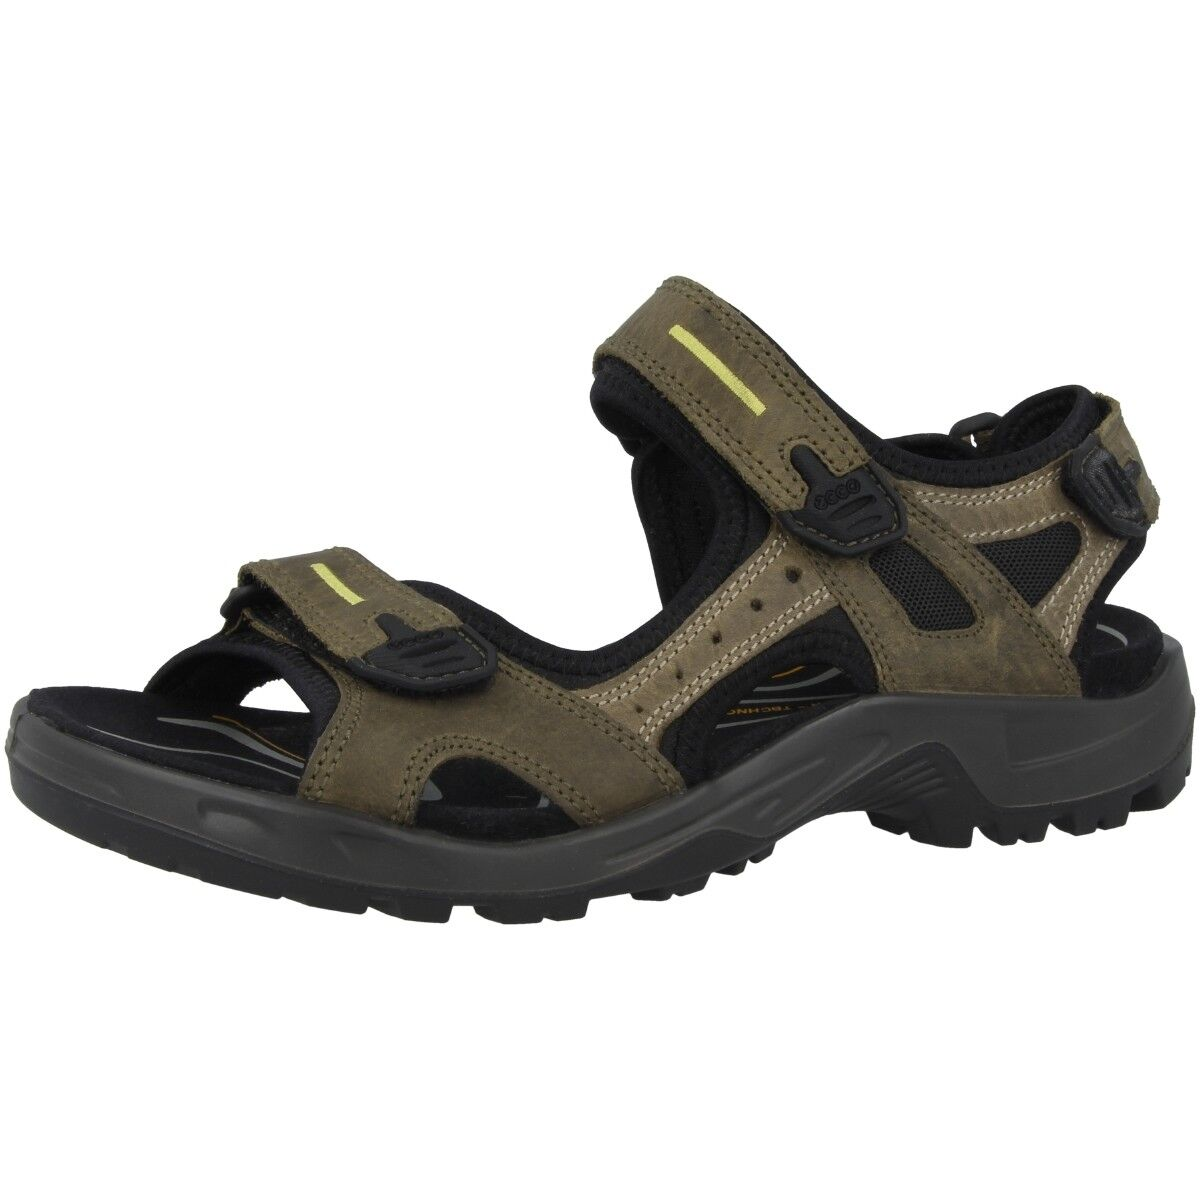 Ecco todoterreno Yucatan Men caballero zapatillas  sandalia Tarmac Moon 069564-56396 trekking  ordenar ahora